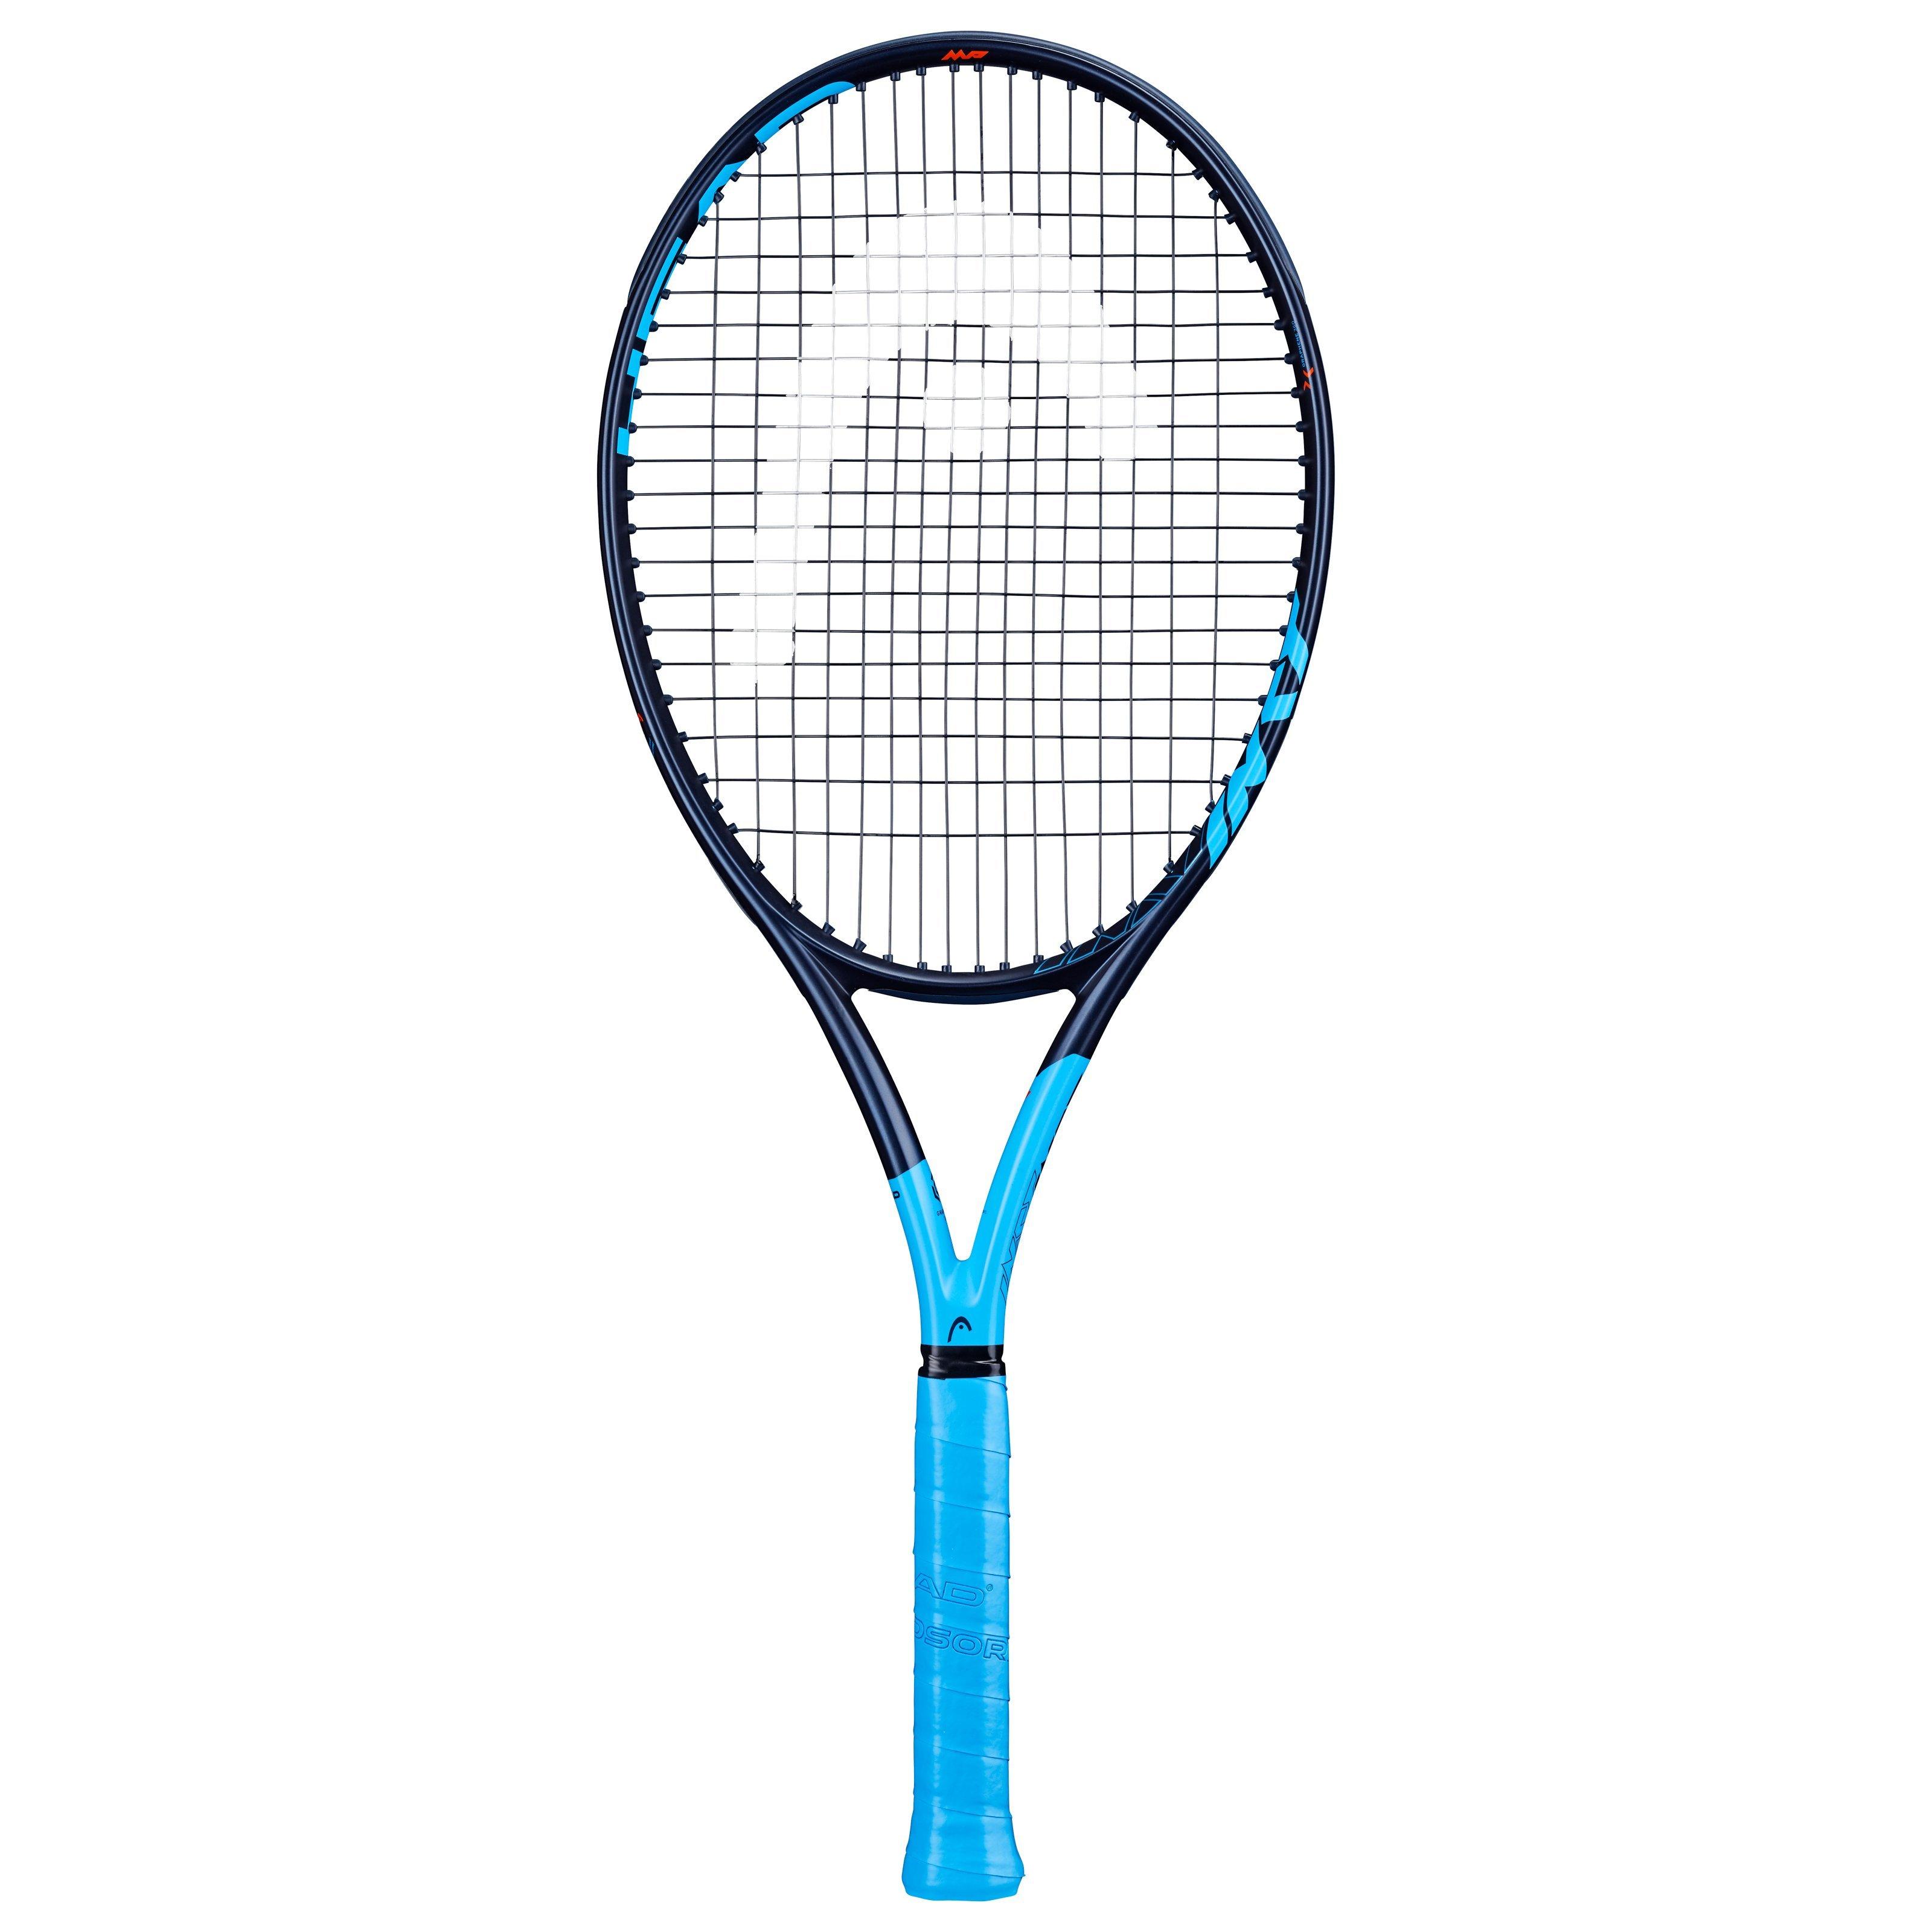 Grip Size 2, 230g Head Graphene 360 Intinct PWR Tennis Racket